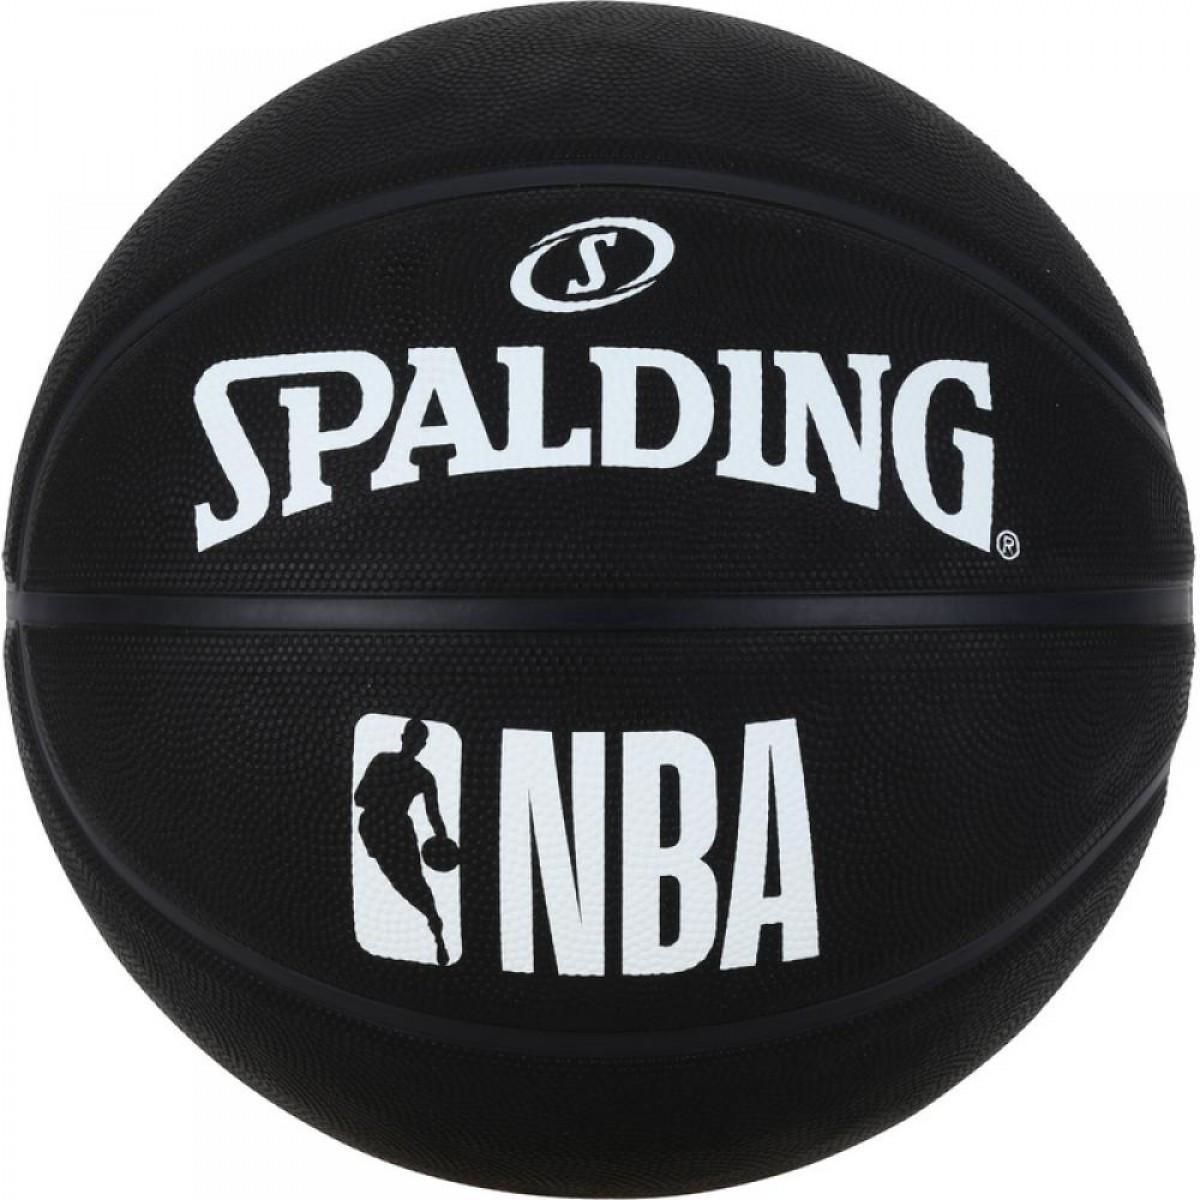 М'яч баскетбольний Spalding NBA Black Size 7